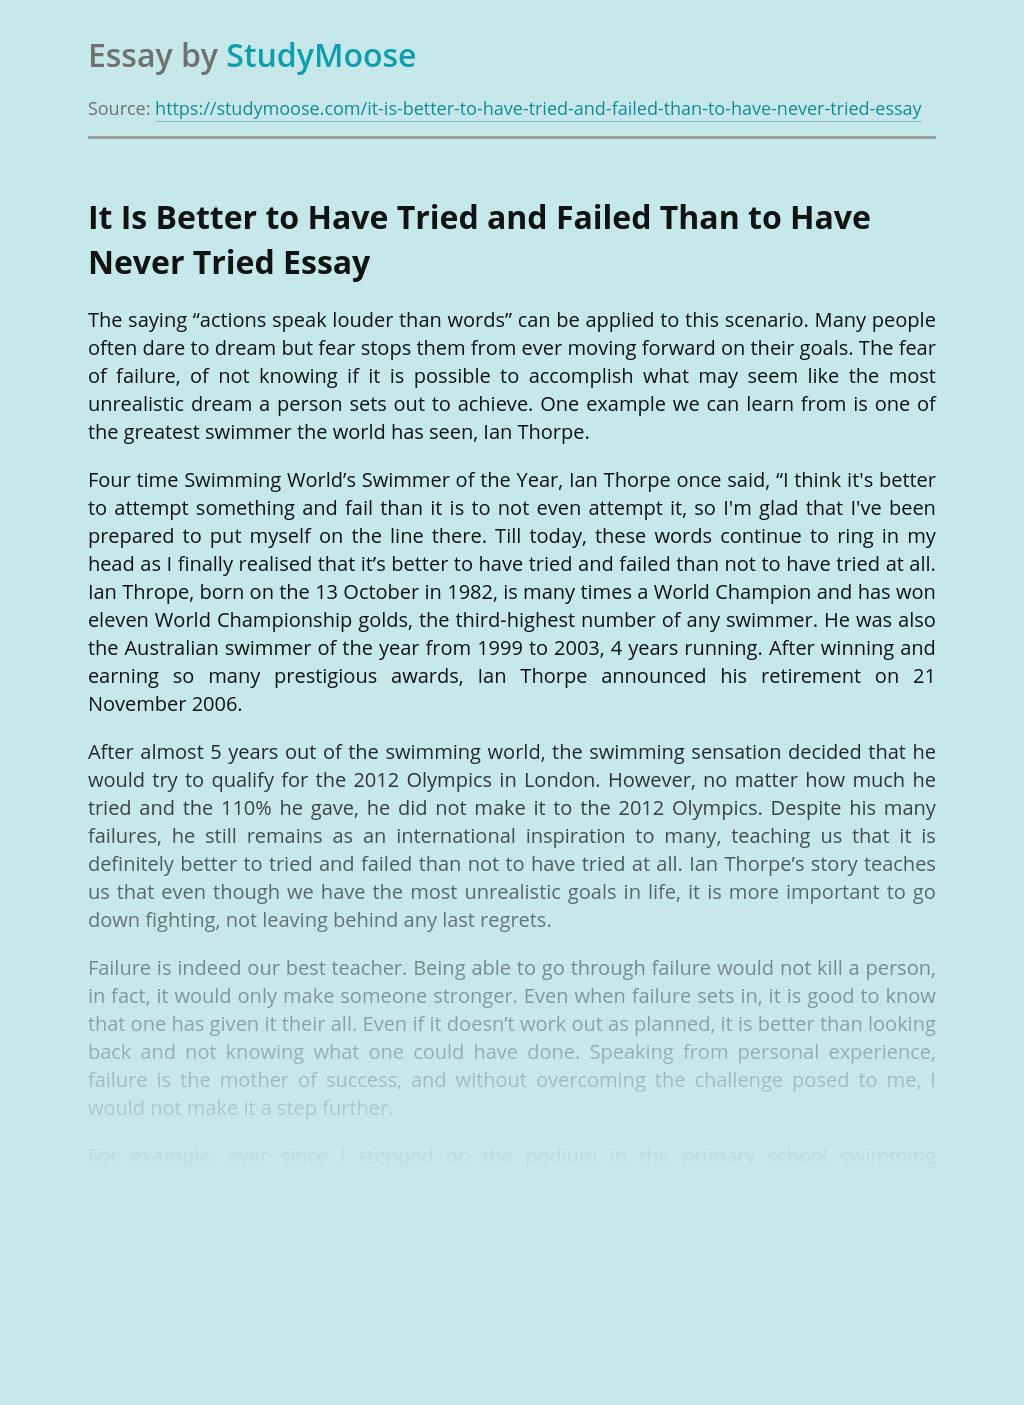 Failure leading to success essays nih biosketch how to write